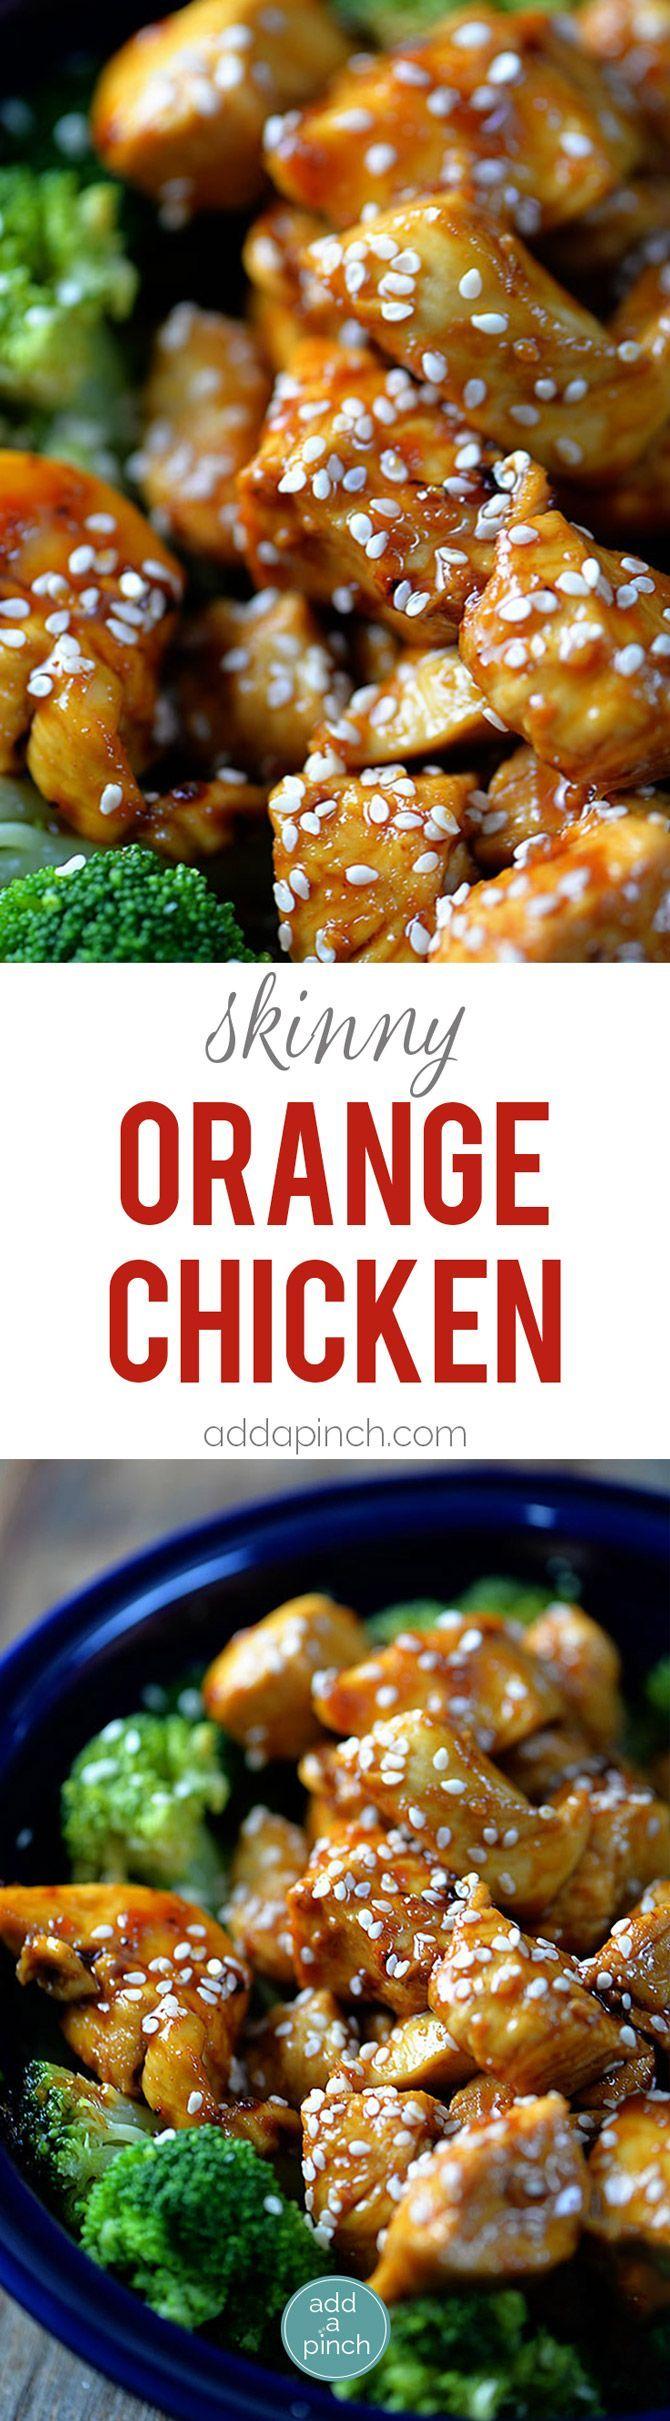 ^^ Orange Chicken makes a favorite Chinese dish. A lightened Orange Chicken recipe which is Paleo-friendly, gluten-free, and grain-free, yet full of flavor! // addapinch.com